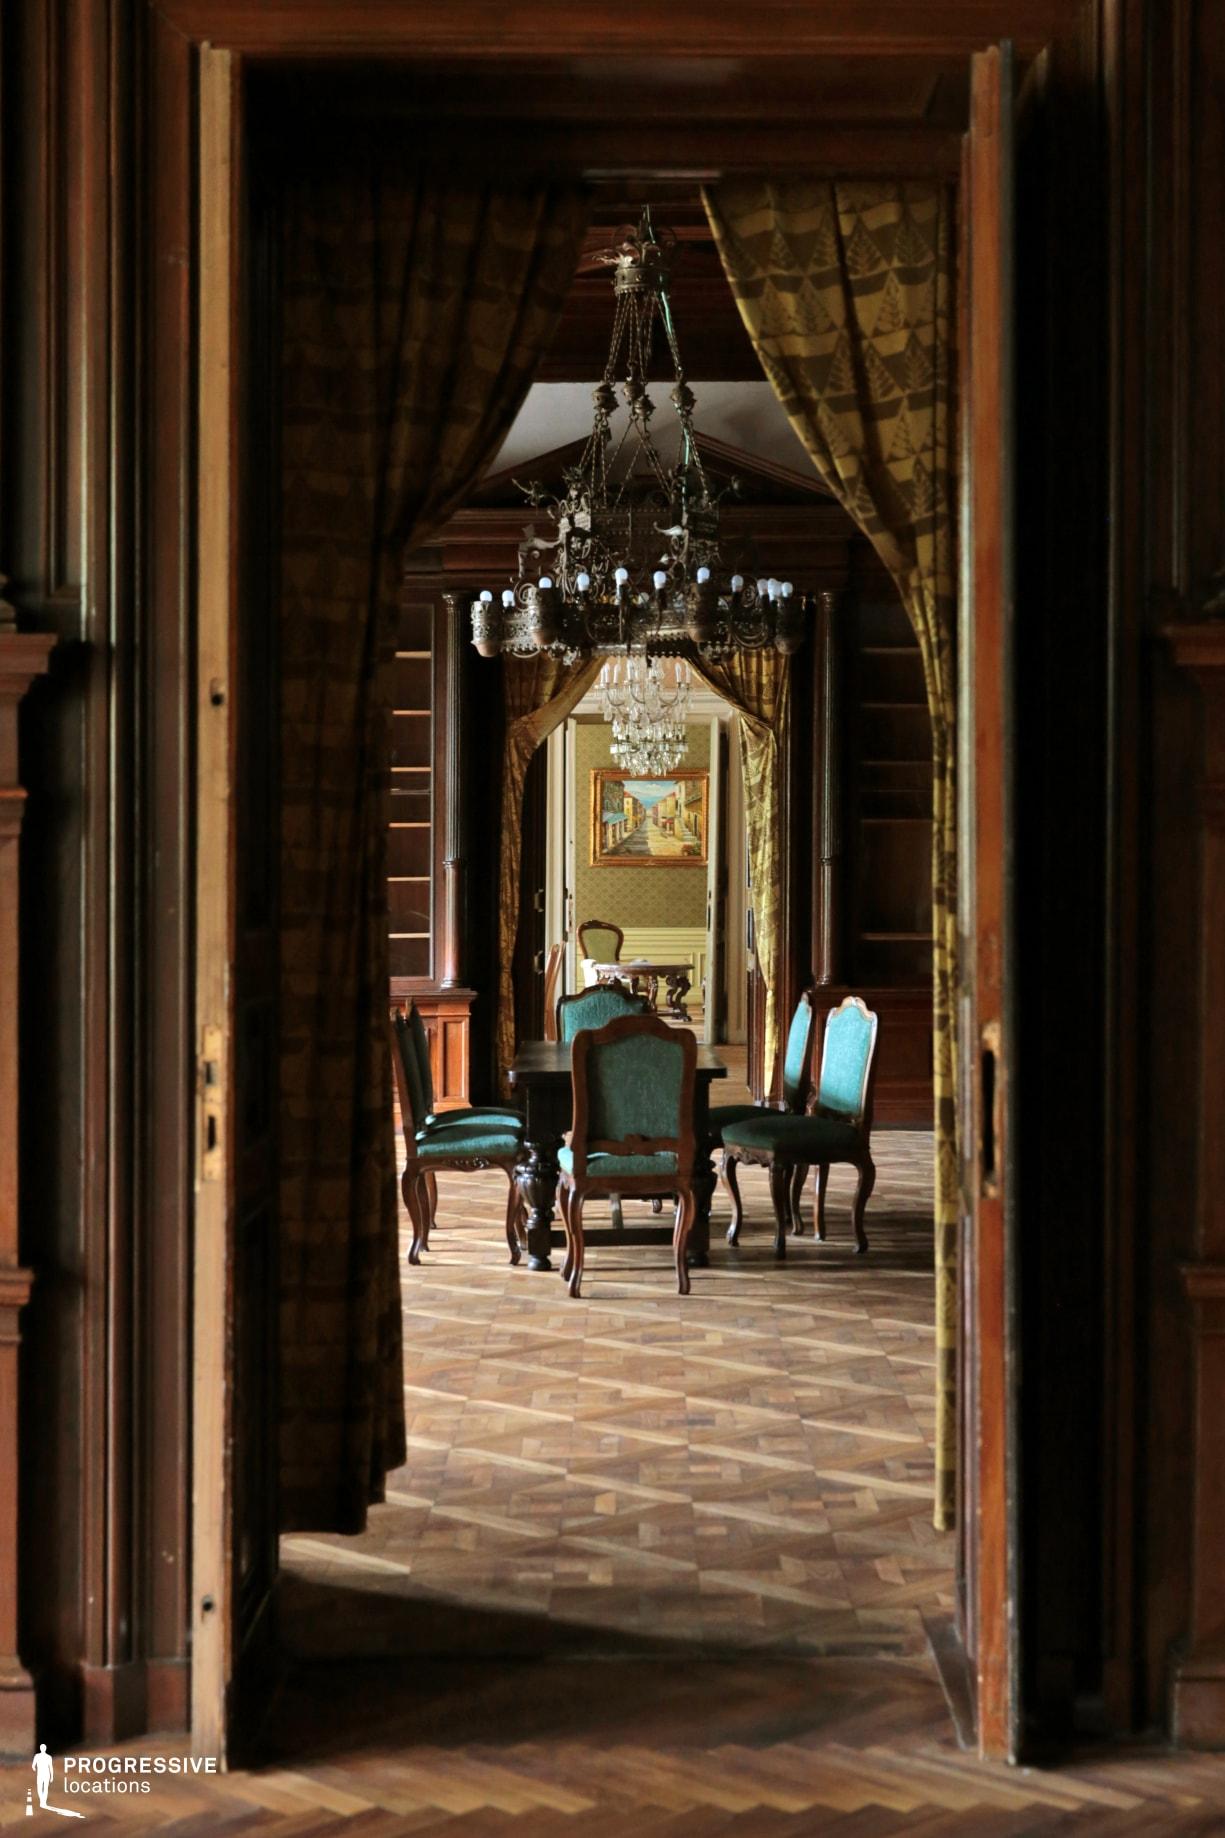 Locations in Hungary: Parketry Salon, Wenckheim Palace